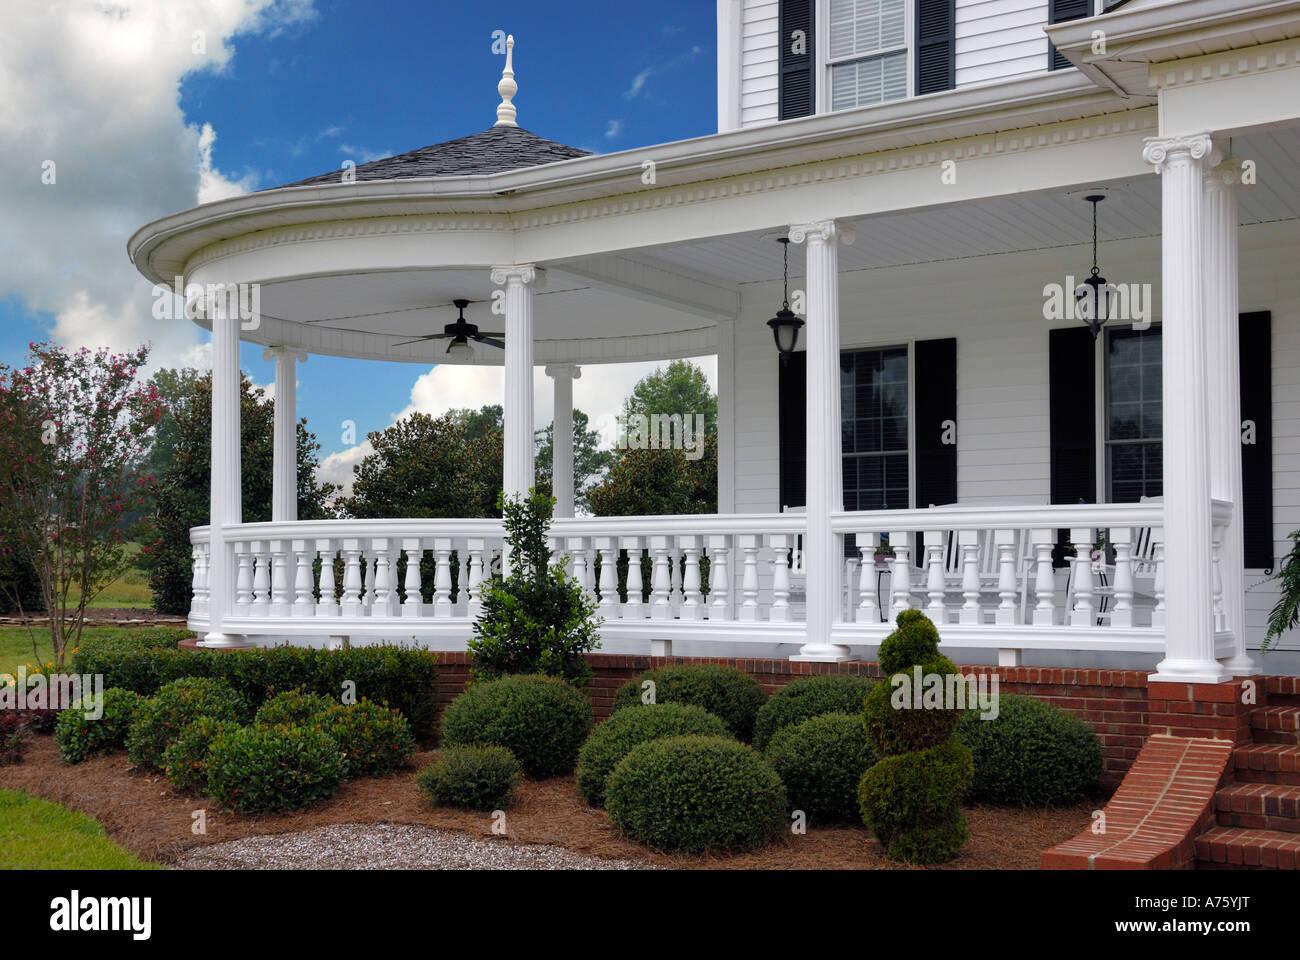 Traditionellen südlichen Stil Veranda USA Ocoee TN Stockfoto, Bild ...